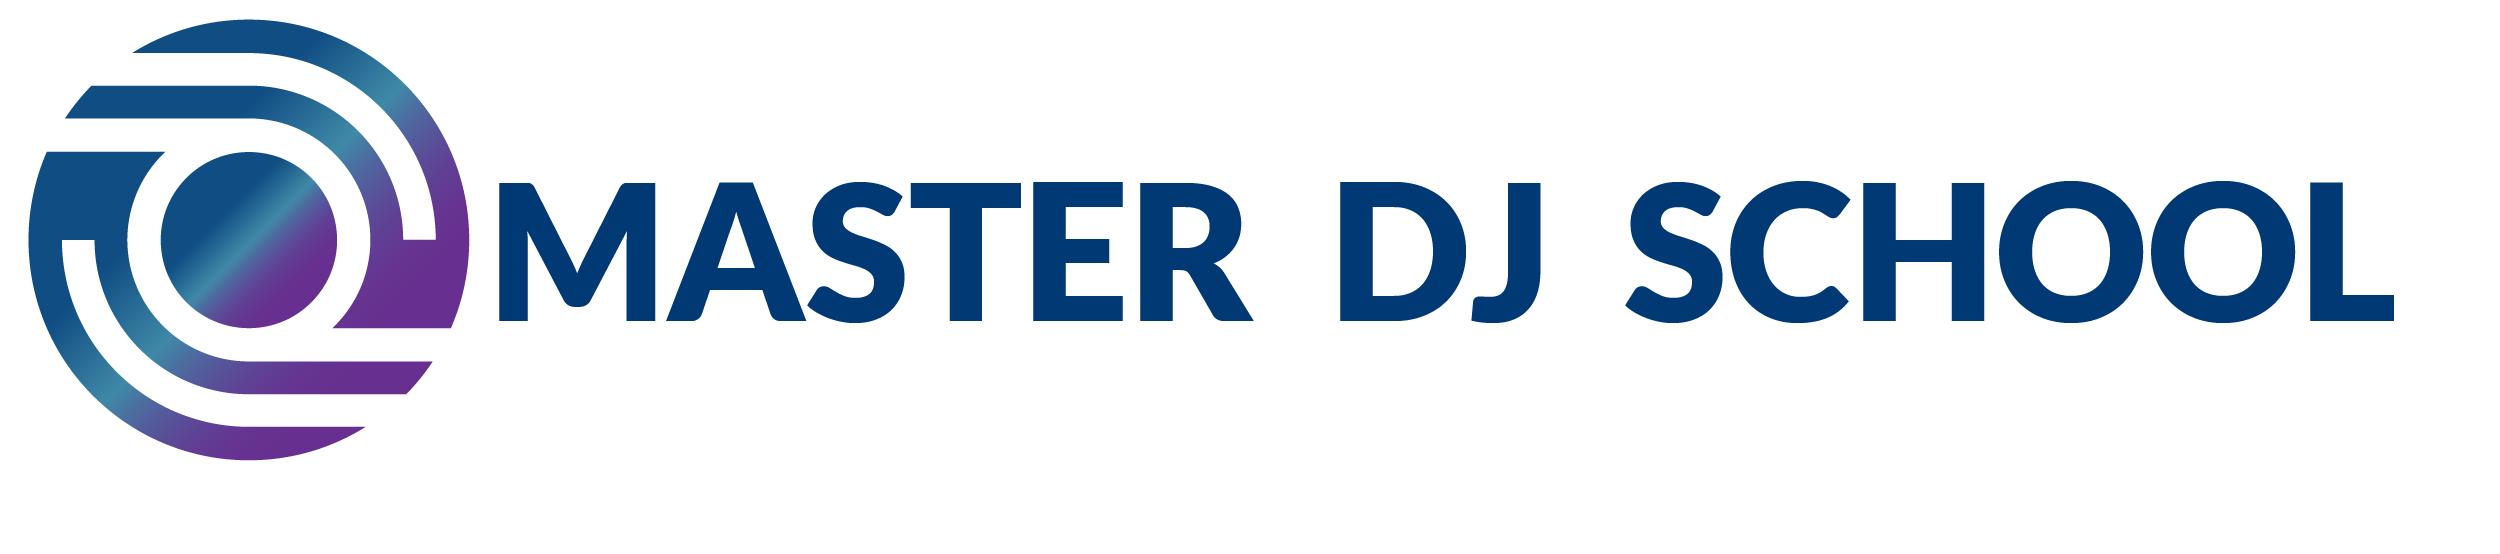 Master DJ School